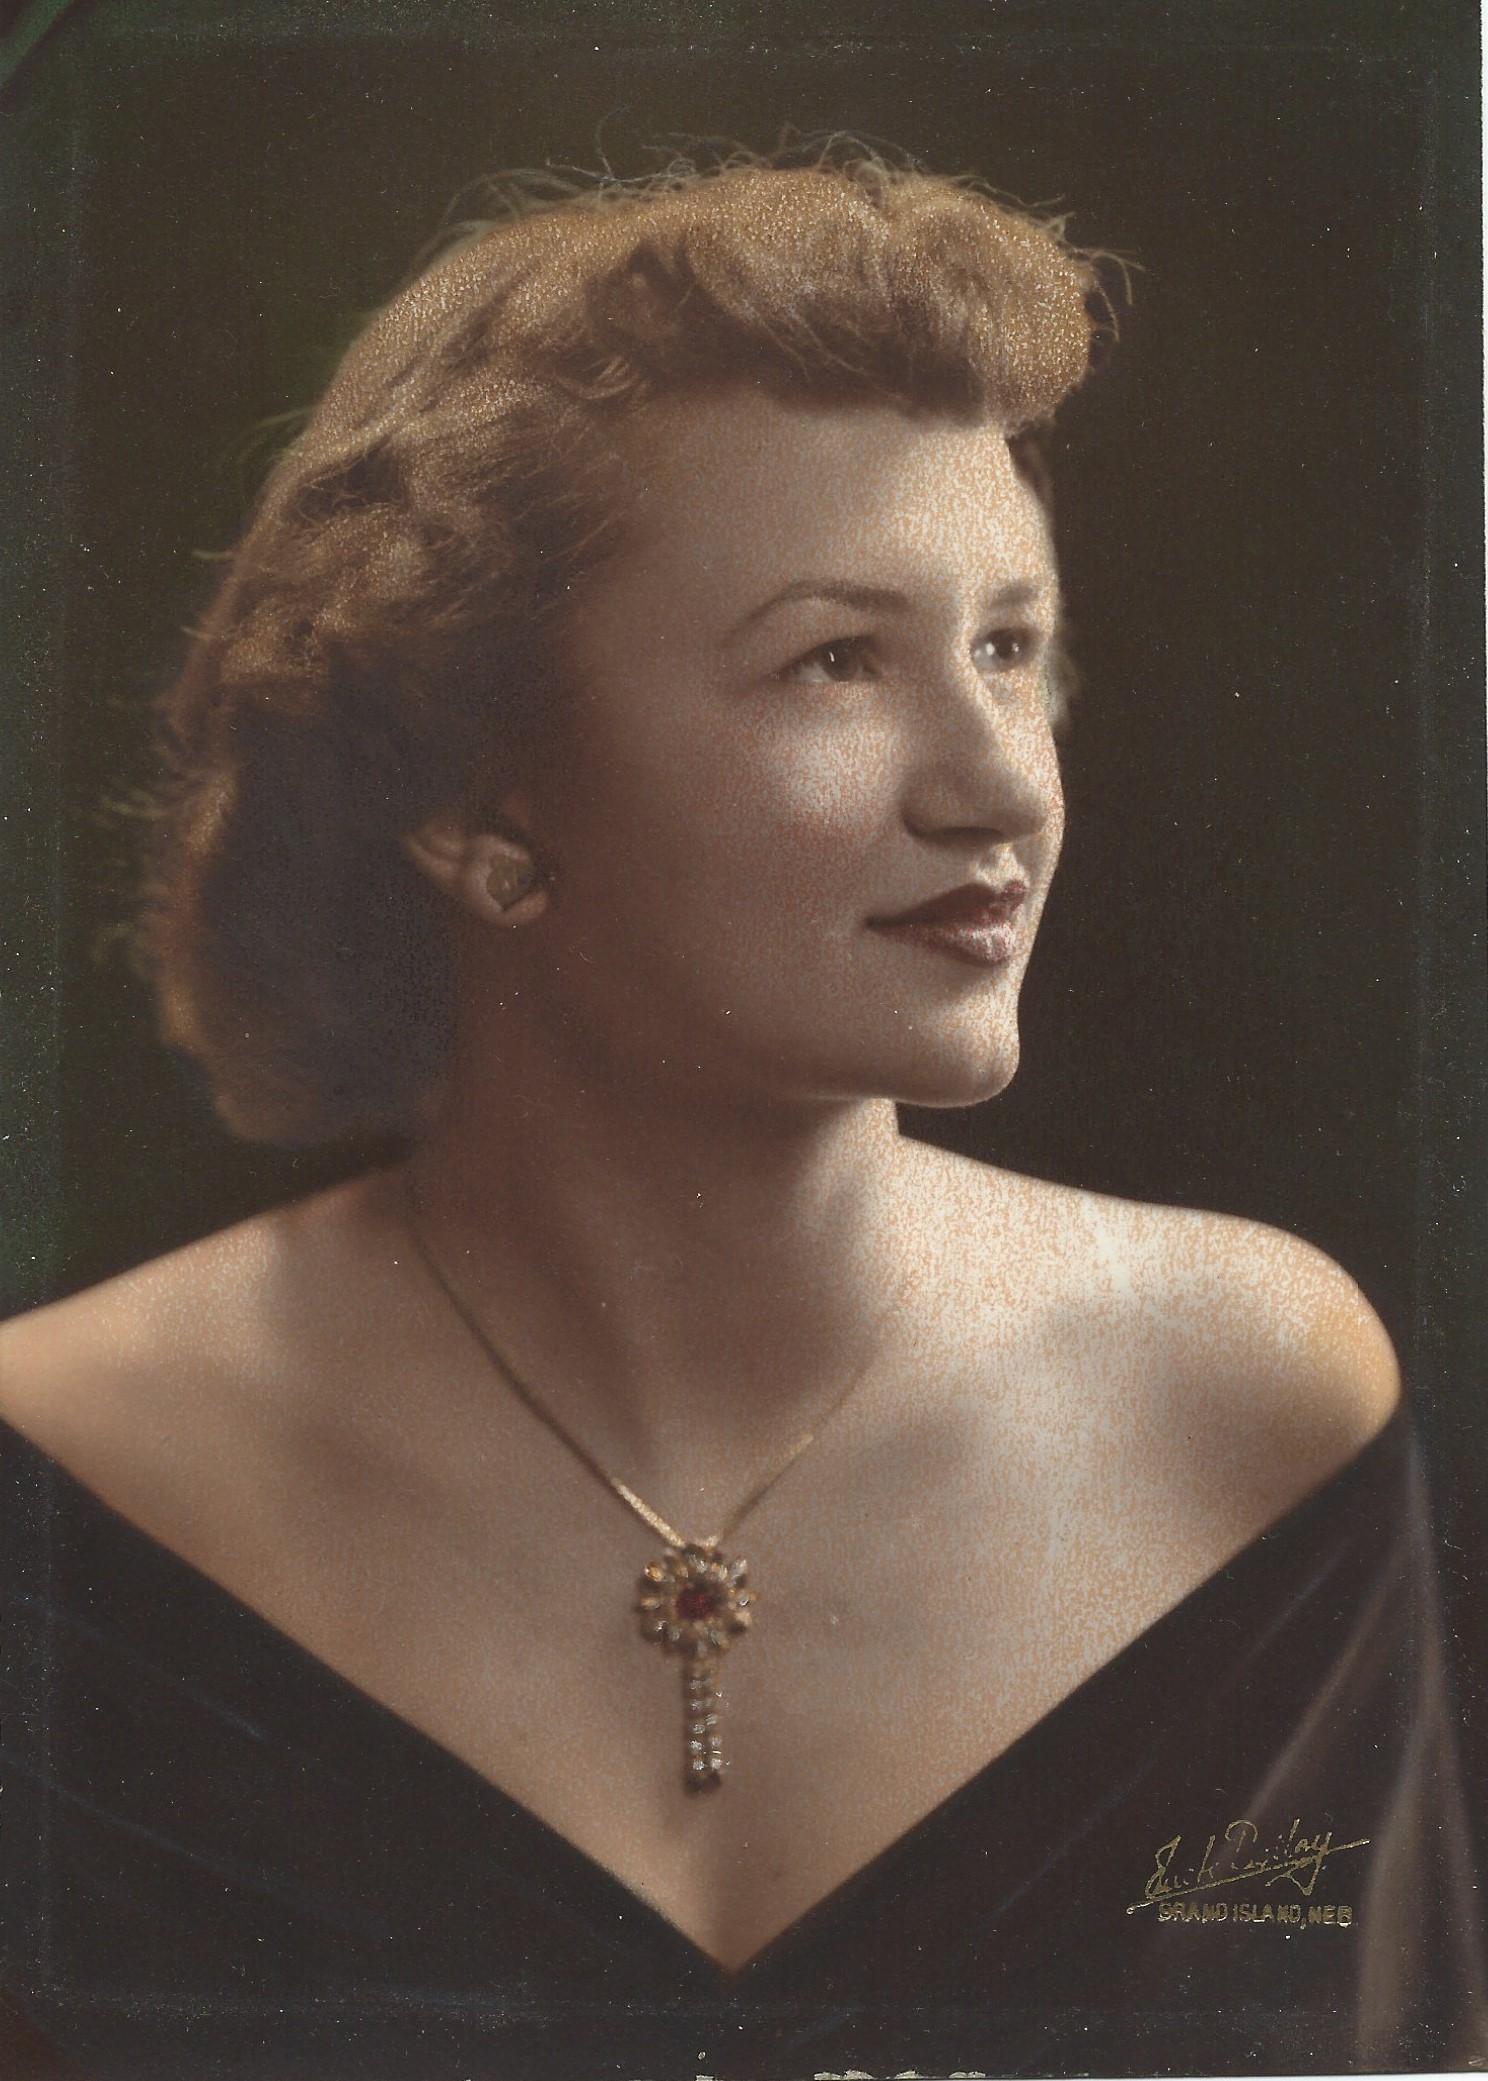 Phyllis T. Friend